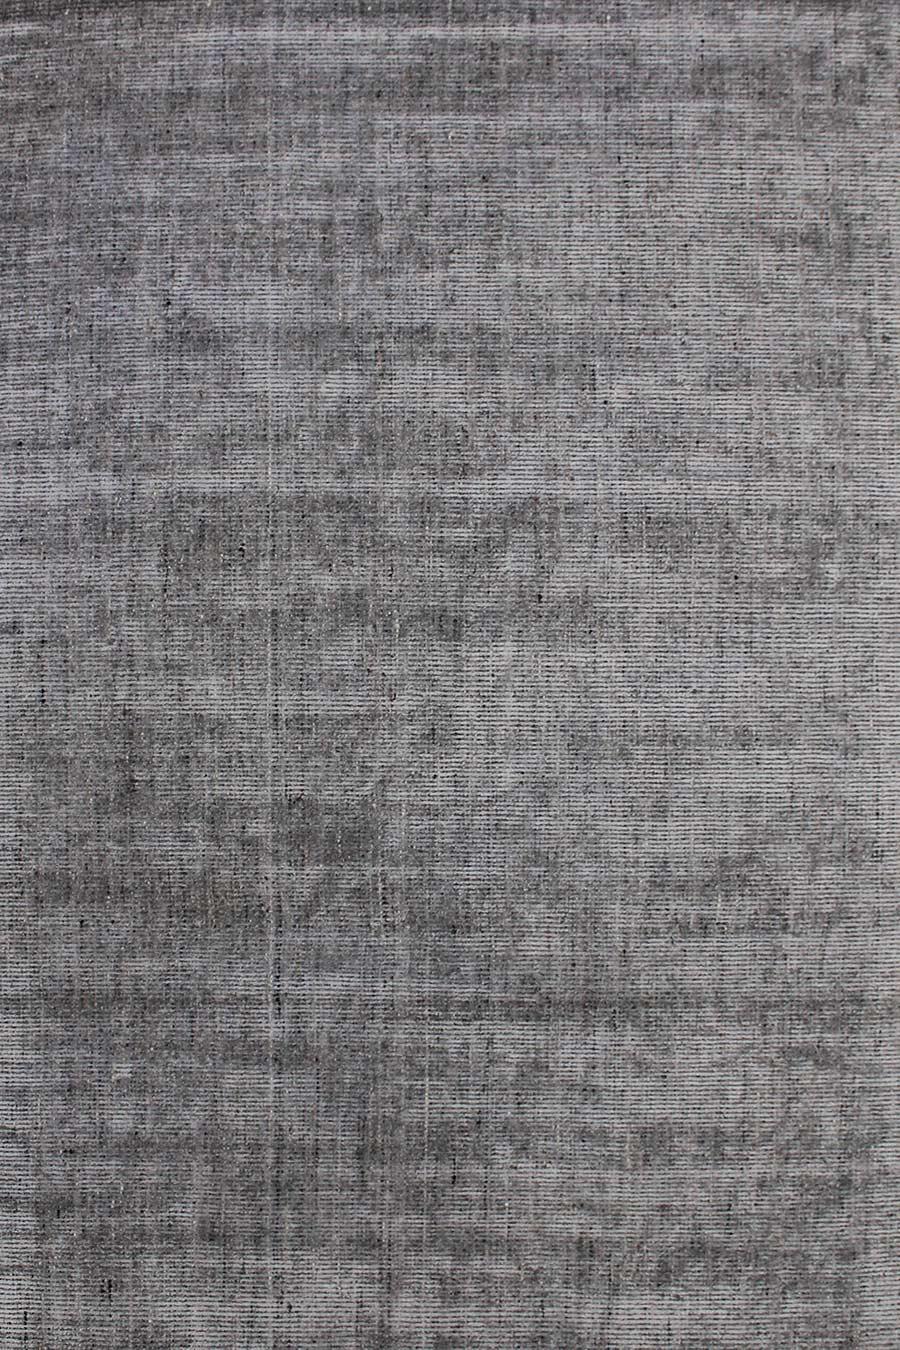 Overhead image of textured Gomez rug in dark grey colour